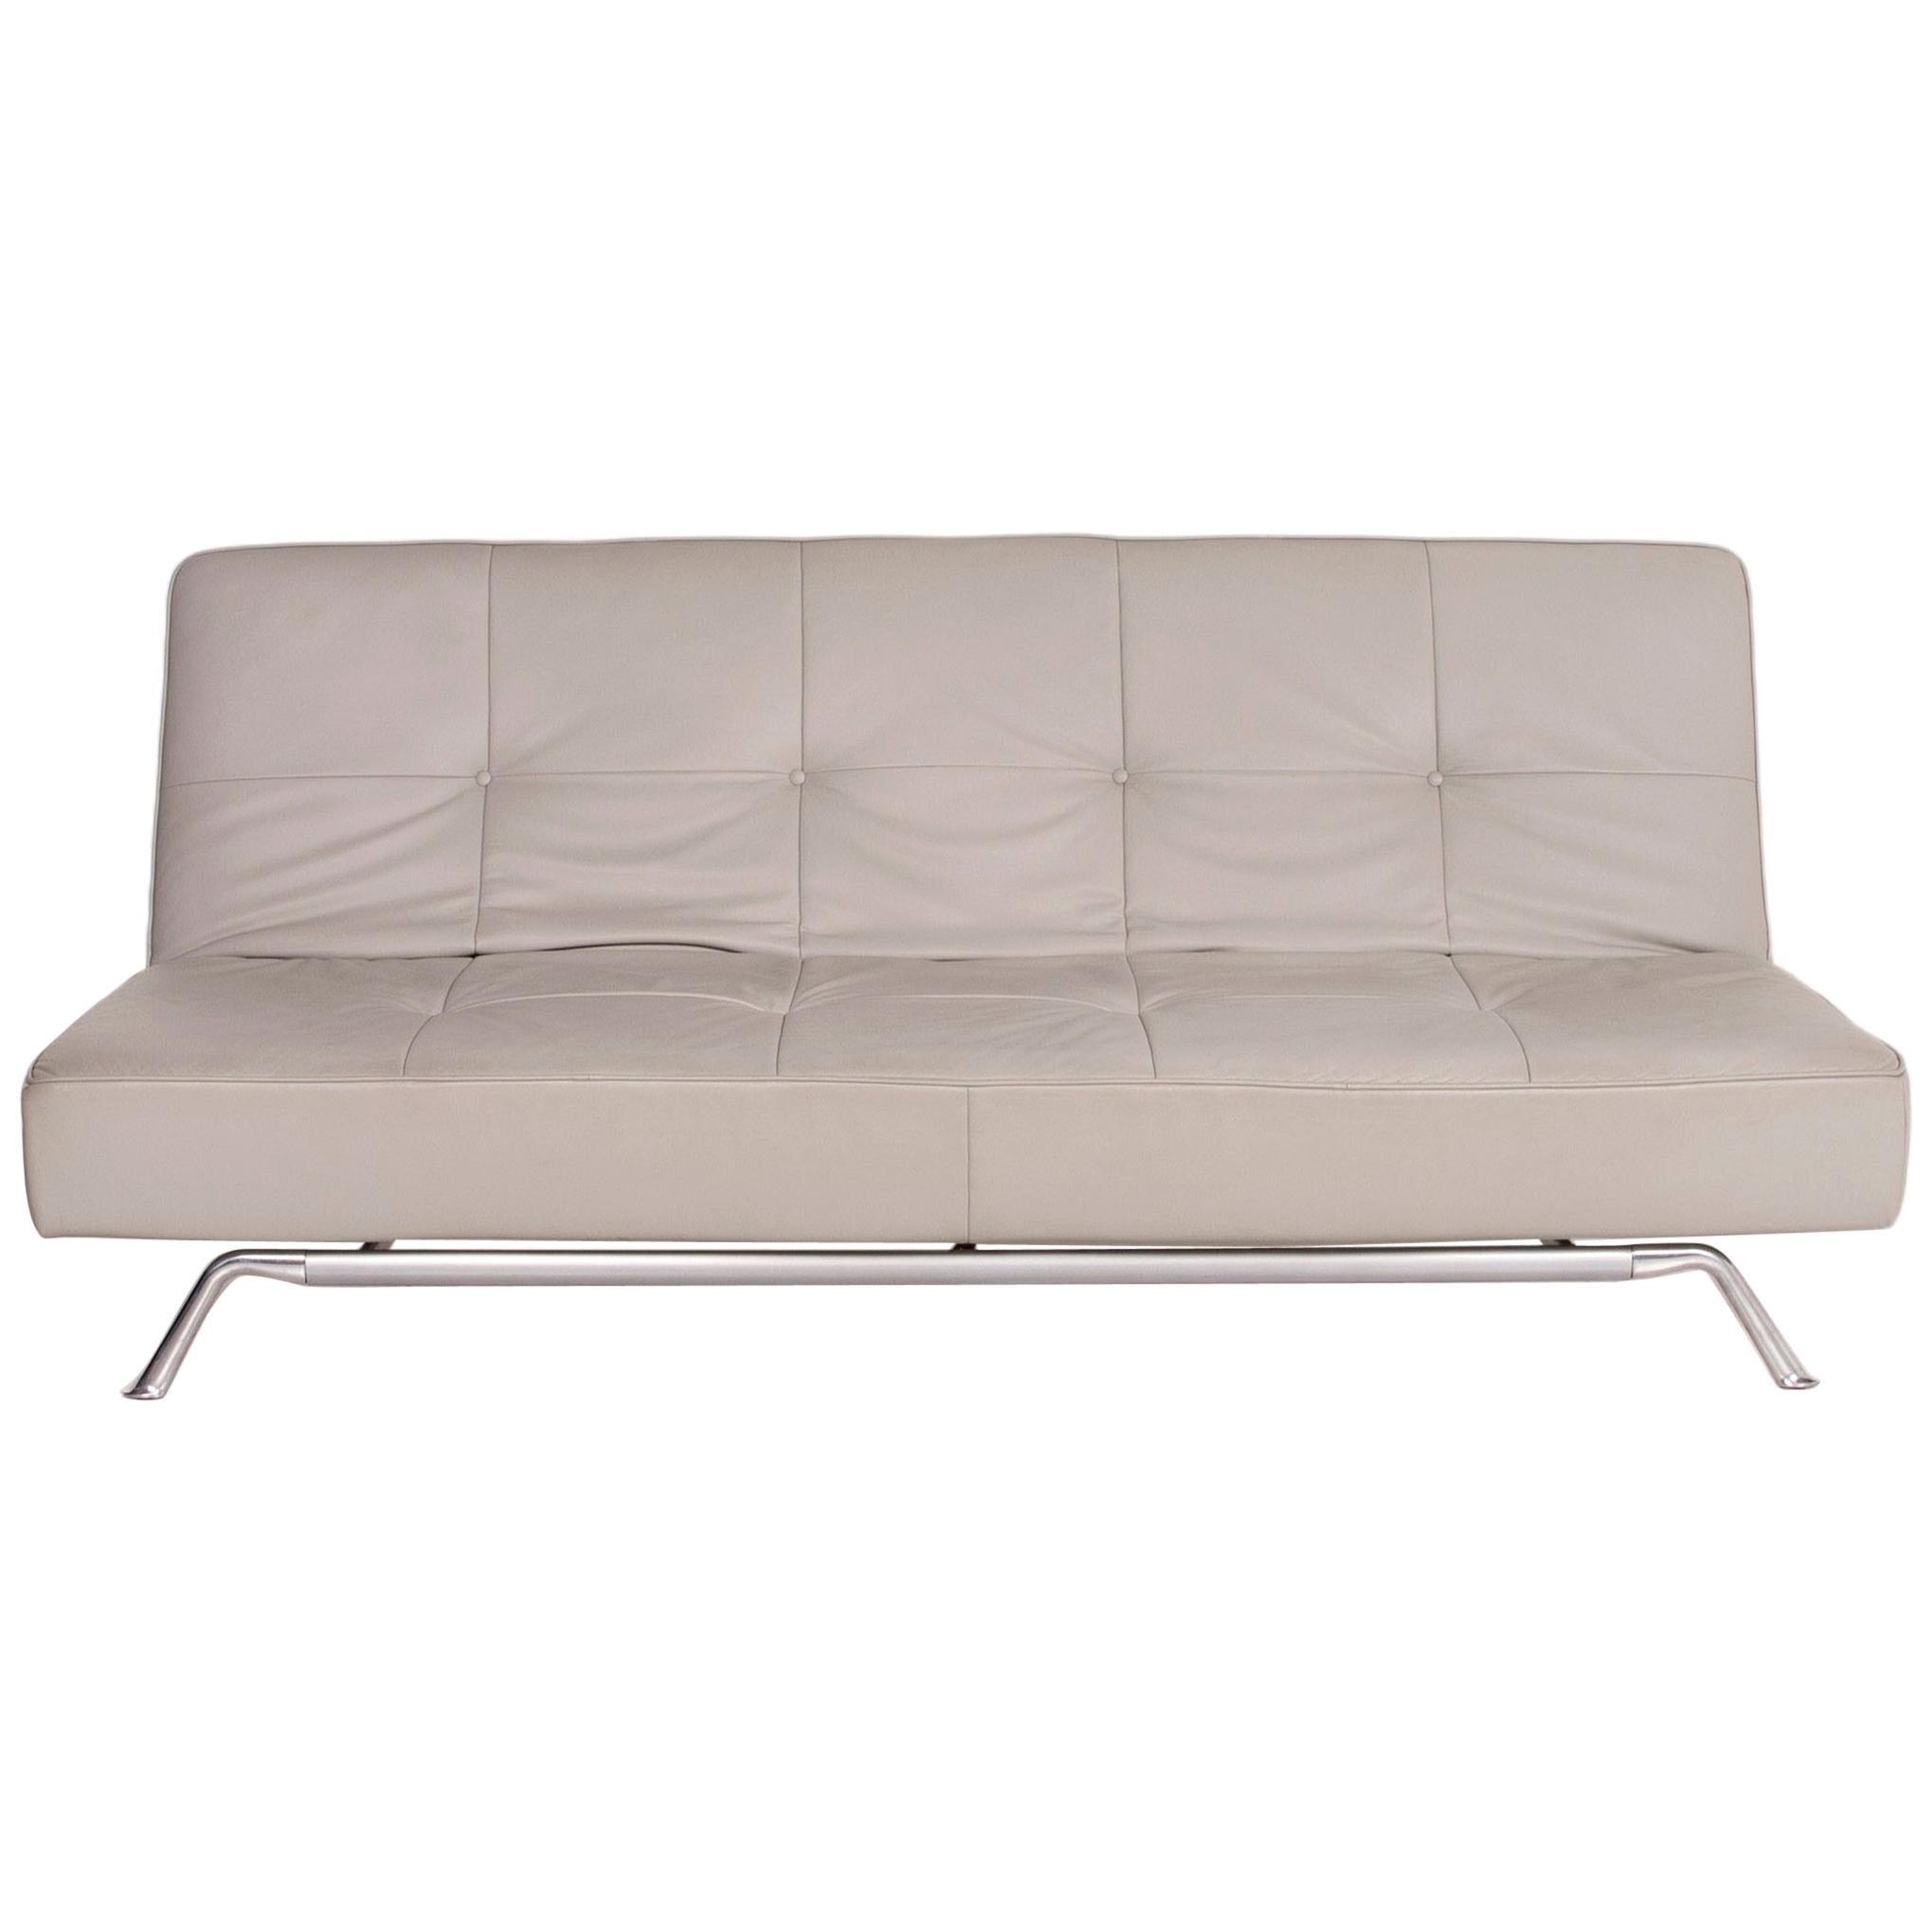 Ligne Roset Smala Leather Sofa Gray Three-Seat Relax Function Sleep Function